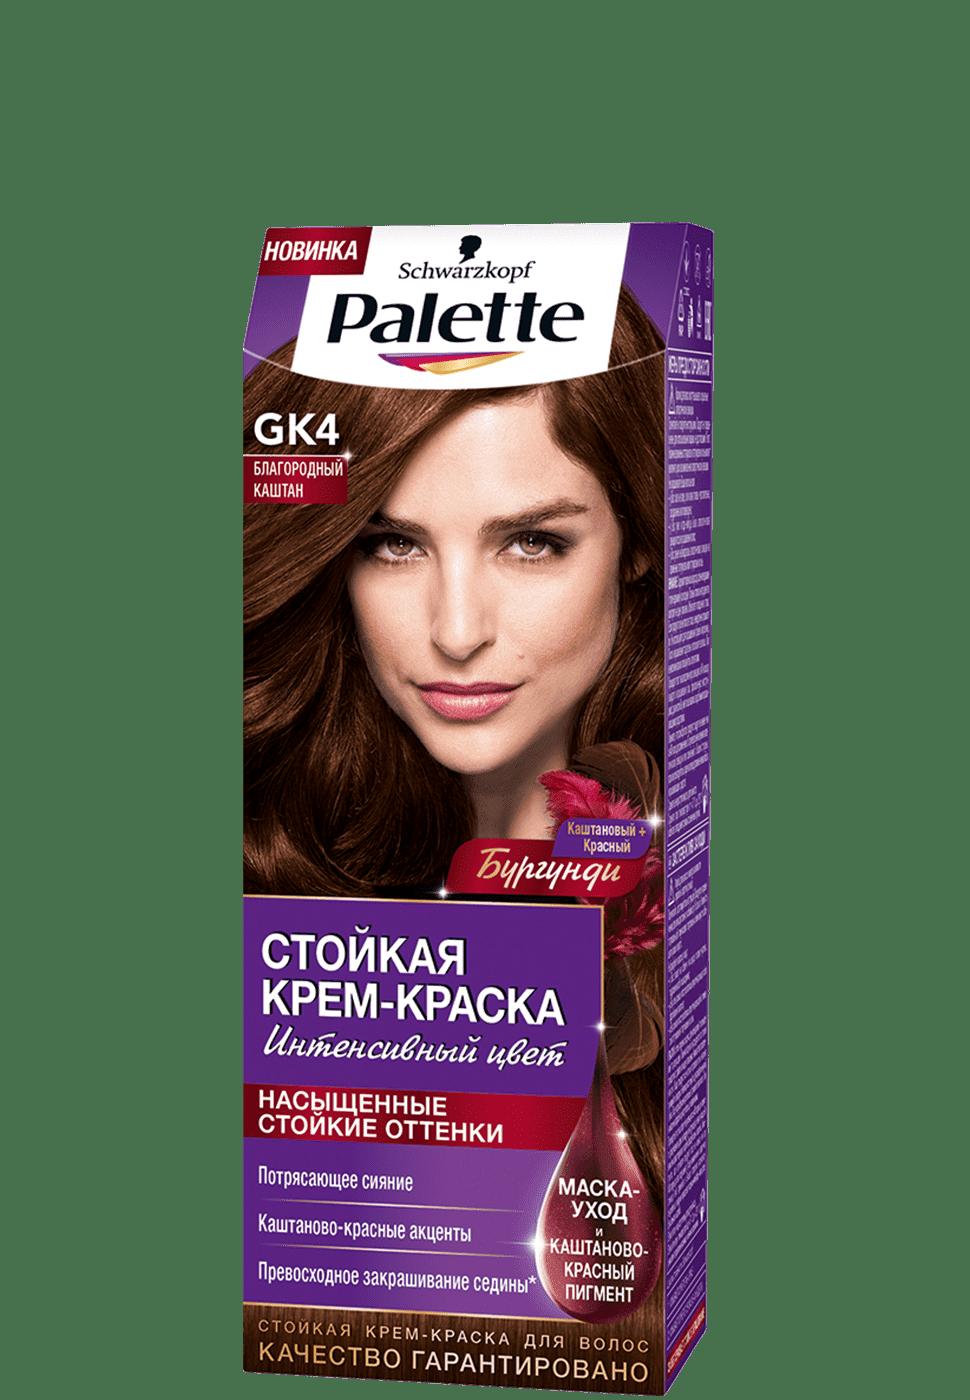 Schwarzkopf Professional, Краска для волос Palette Icc, 50 мл (40 оттенков) GK4 Благородный каштан